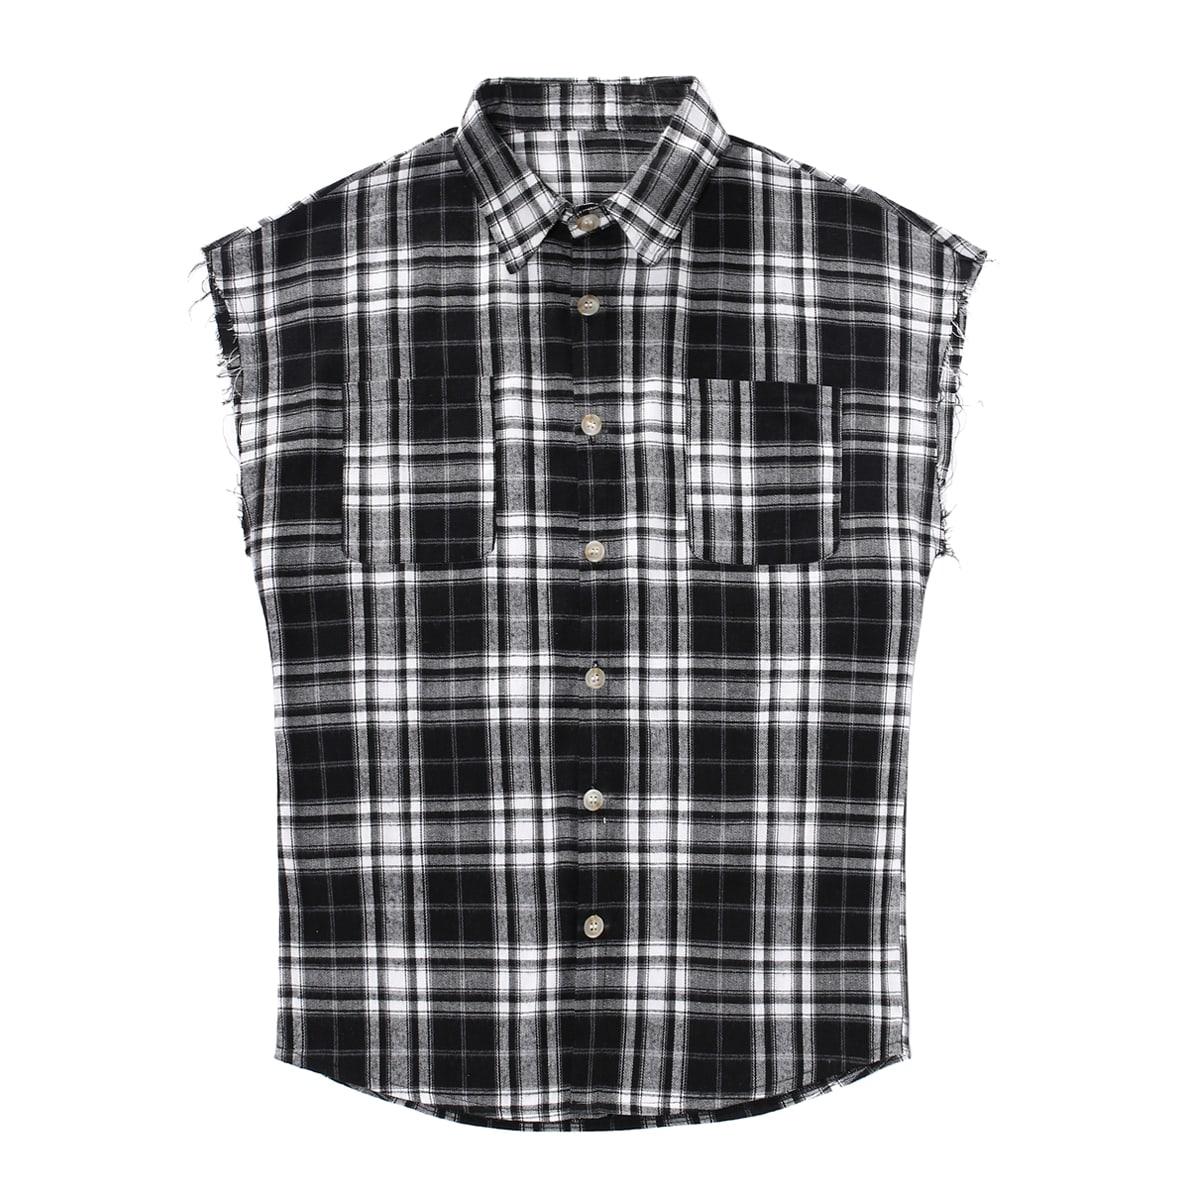 Мужской Рубашка в клетку на пуговицах без рукавов SheIn smshirt25210511441